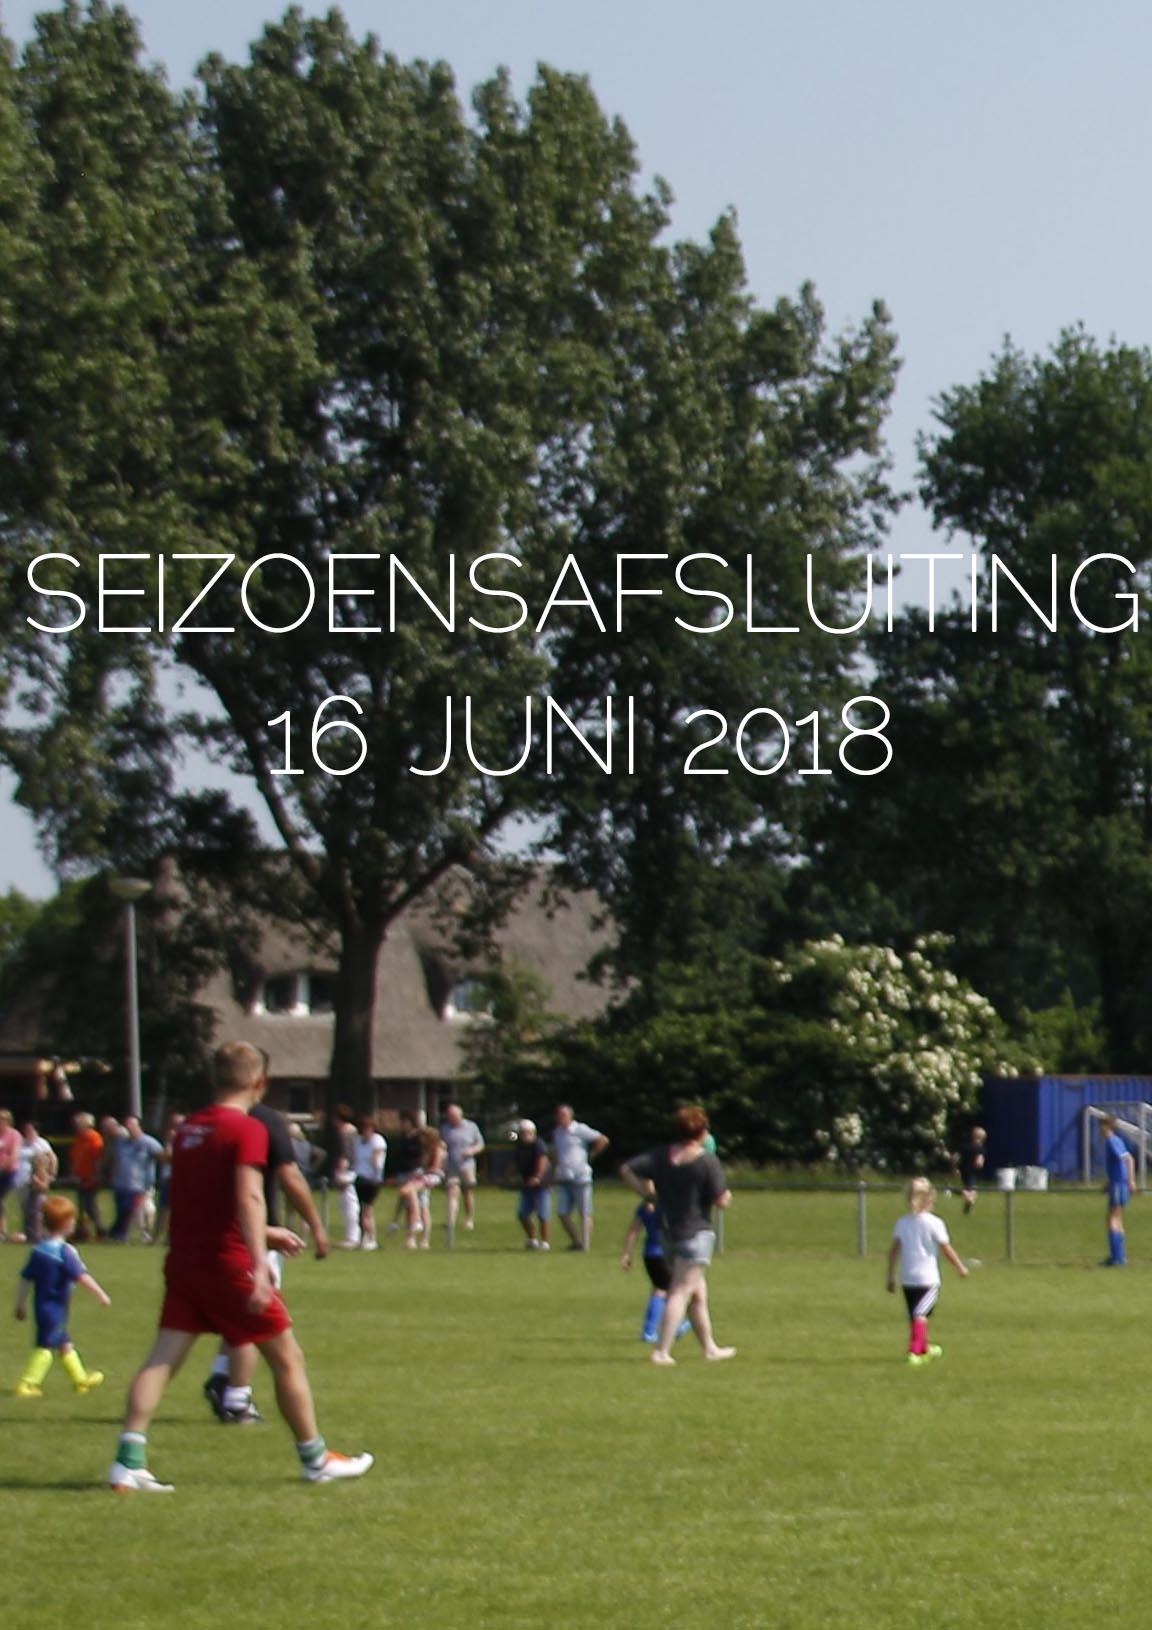 Seizoensafsluiting SV Blokzijl